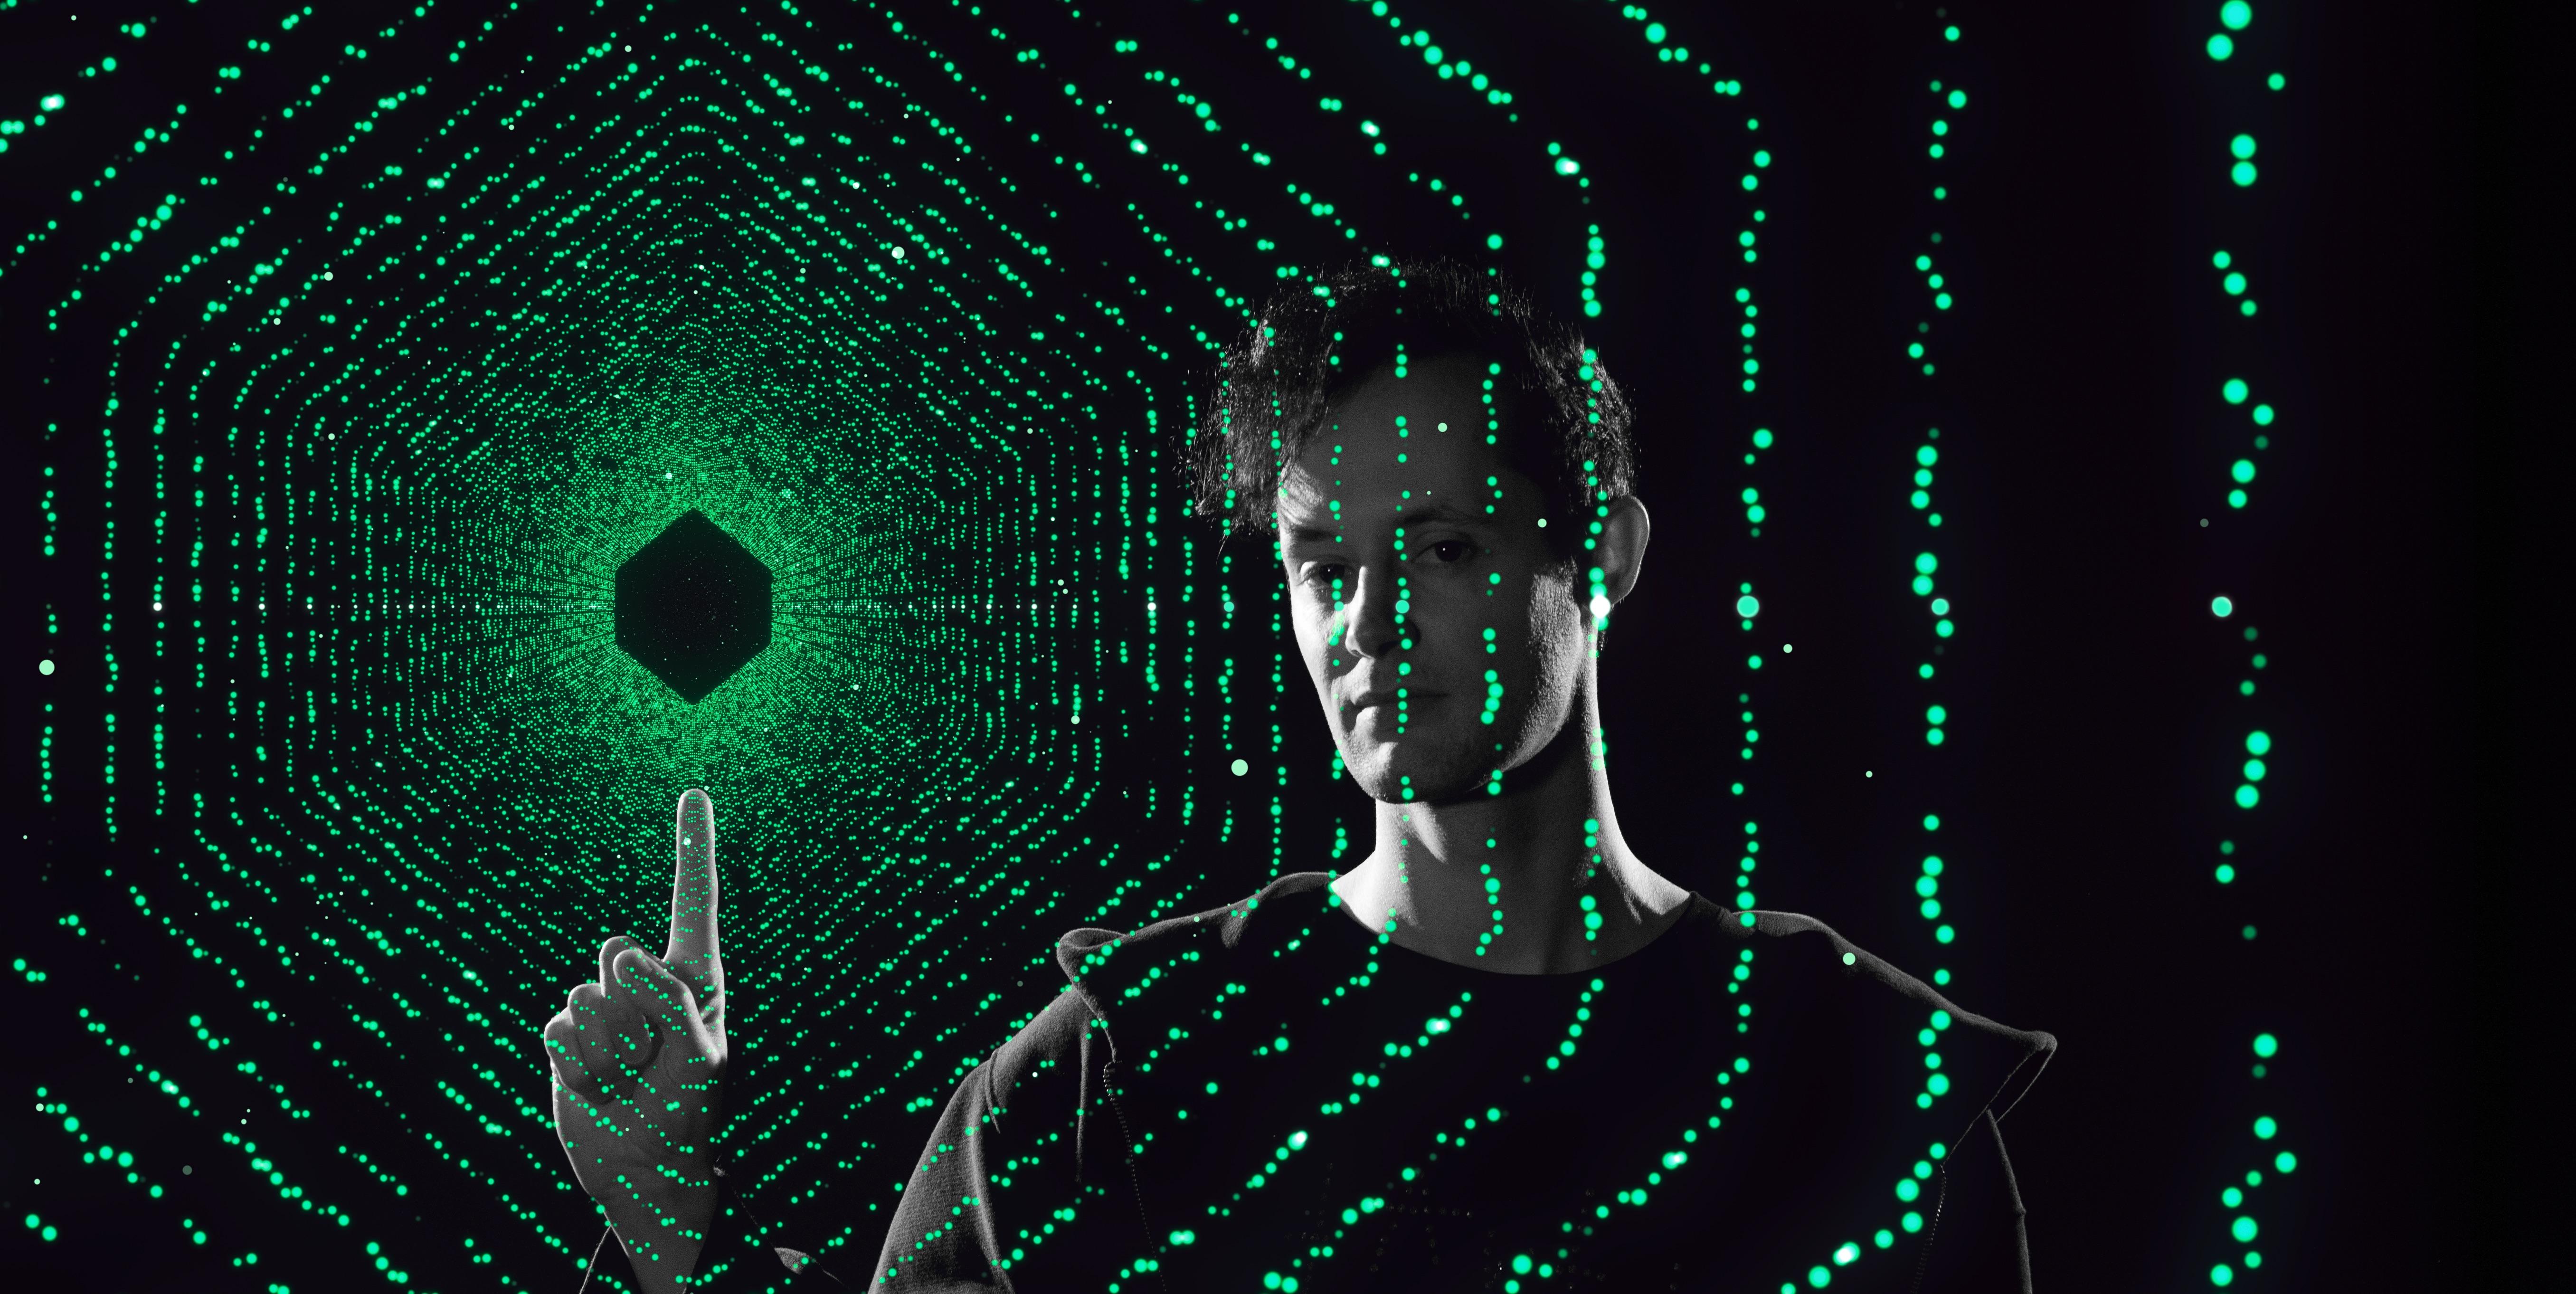 Numerairecrypto review